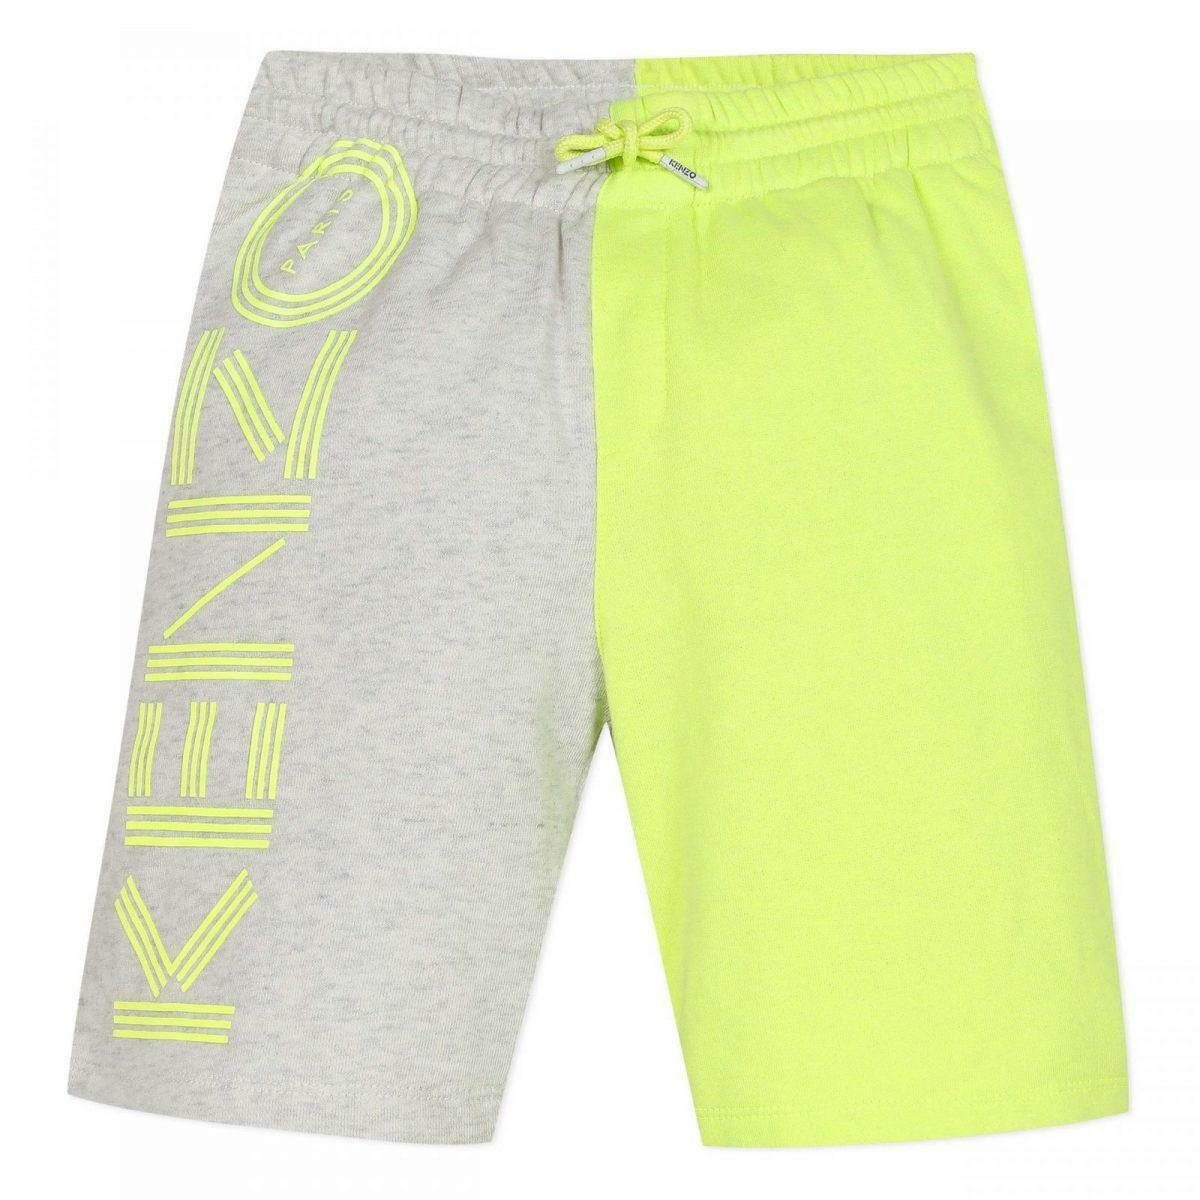 kenzo kenzo bermuda junior grigio giallo fluo kq256581